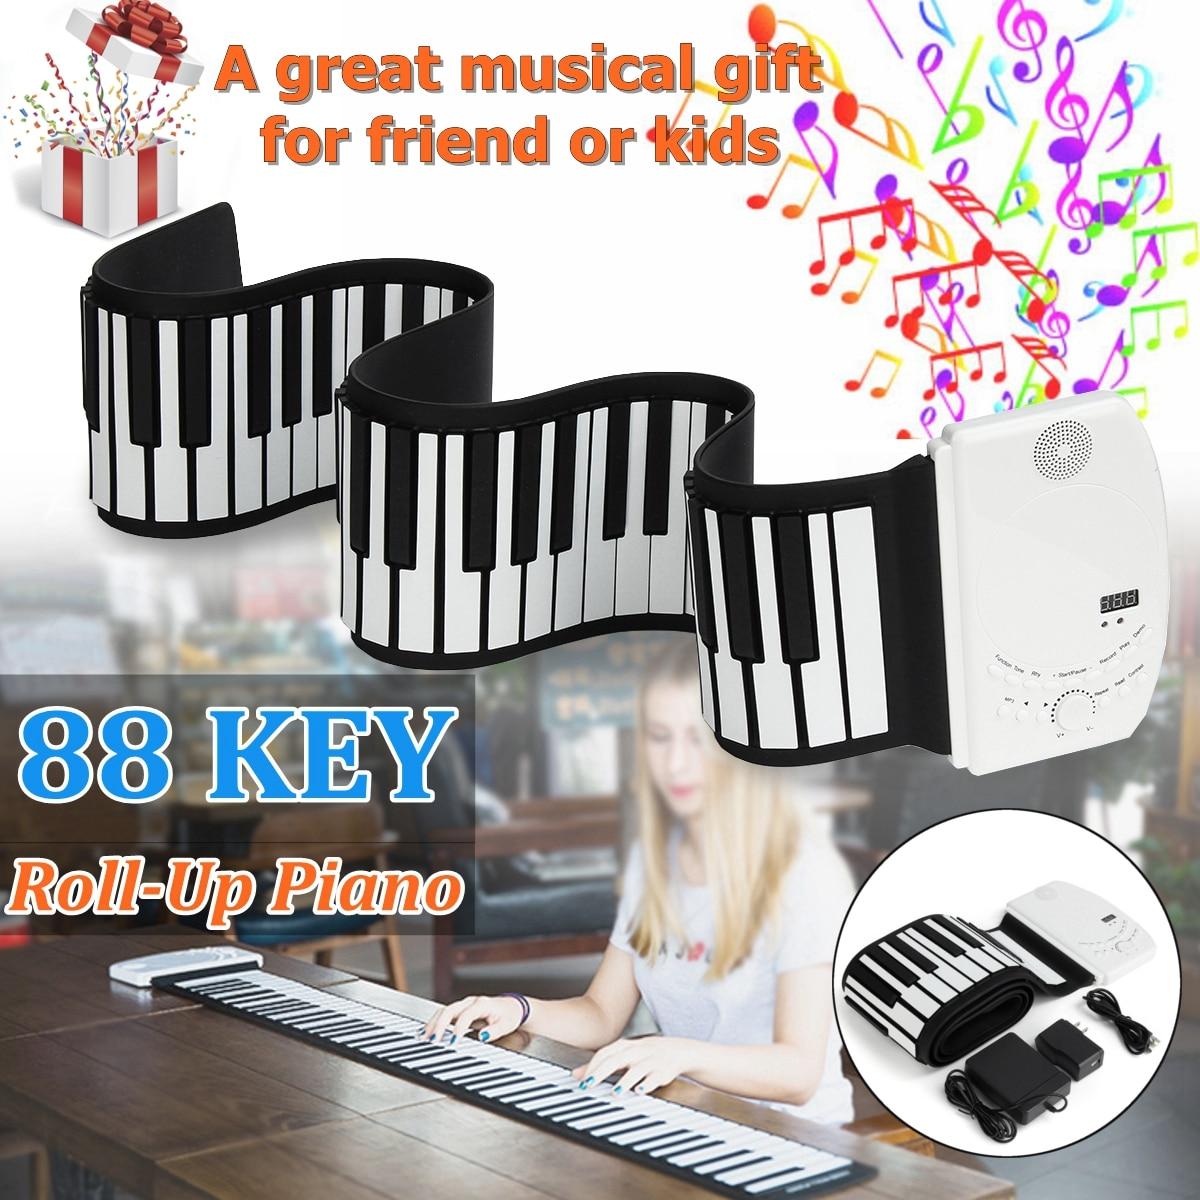 лучшая цена SENRHY 88 Keys Flexible Foldable Piano Portable Electric Digital Roll up Keyboard Piano For Musical Instruments Lover Presents